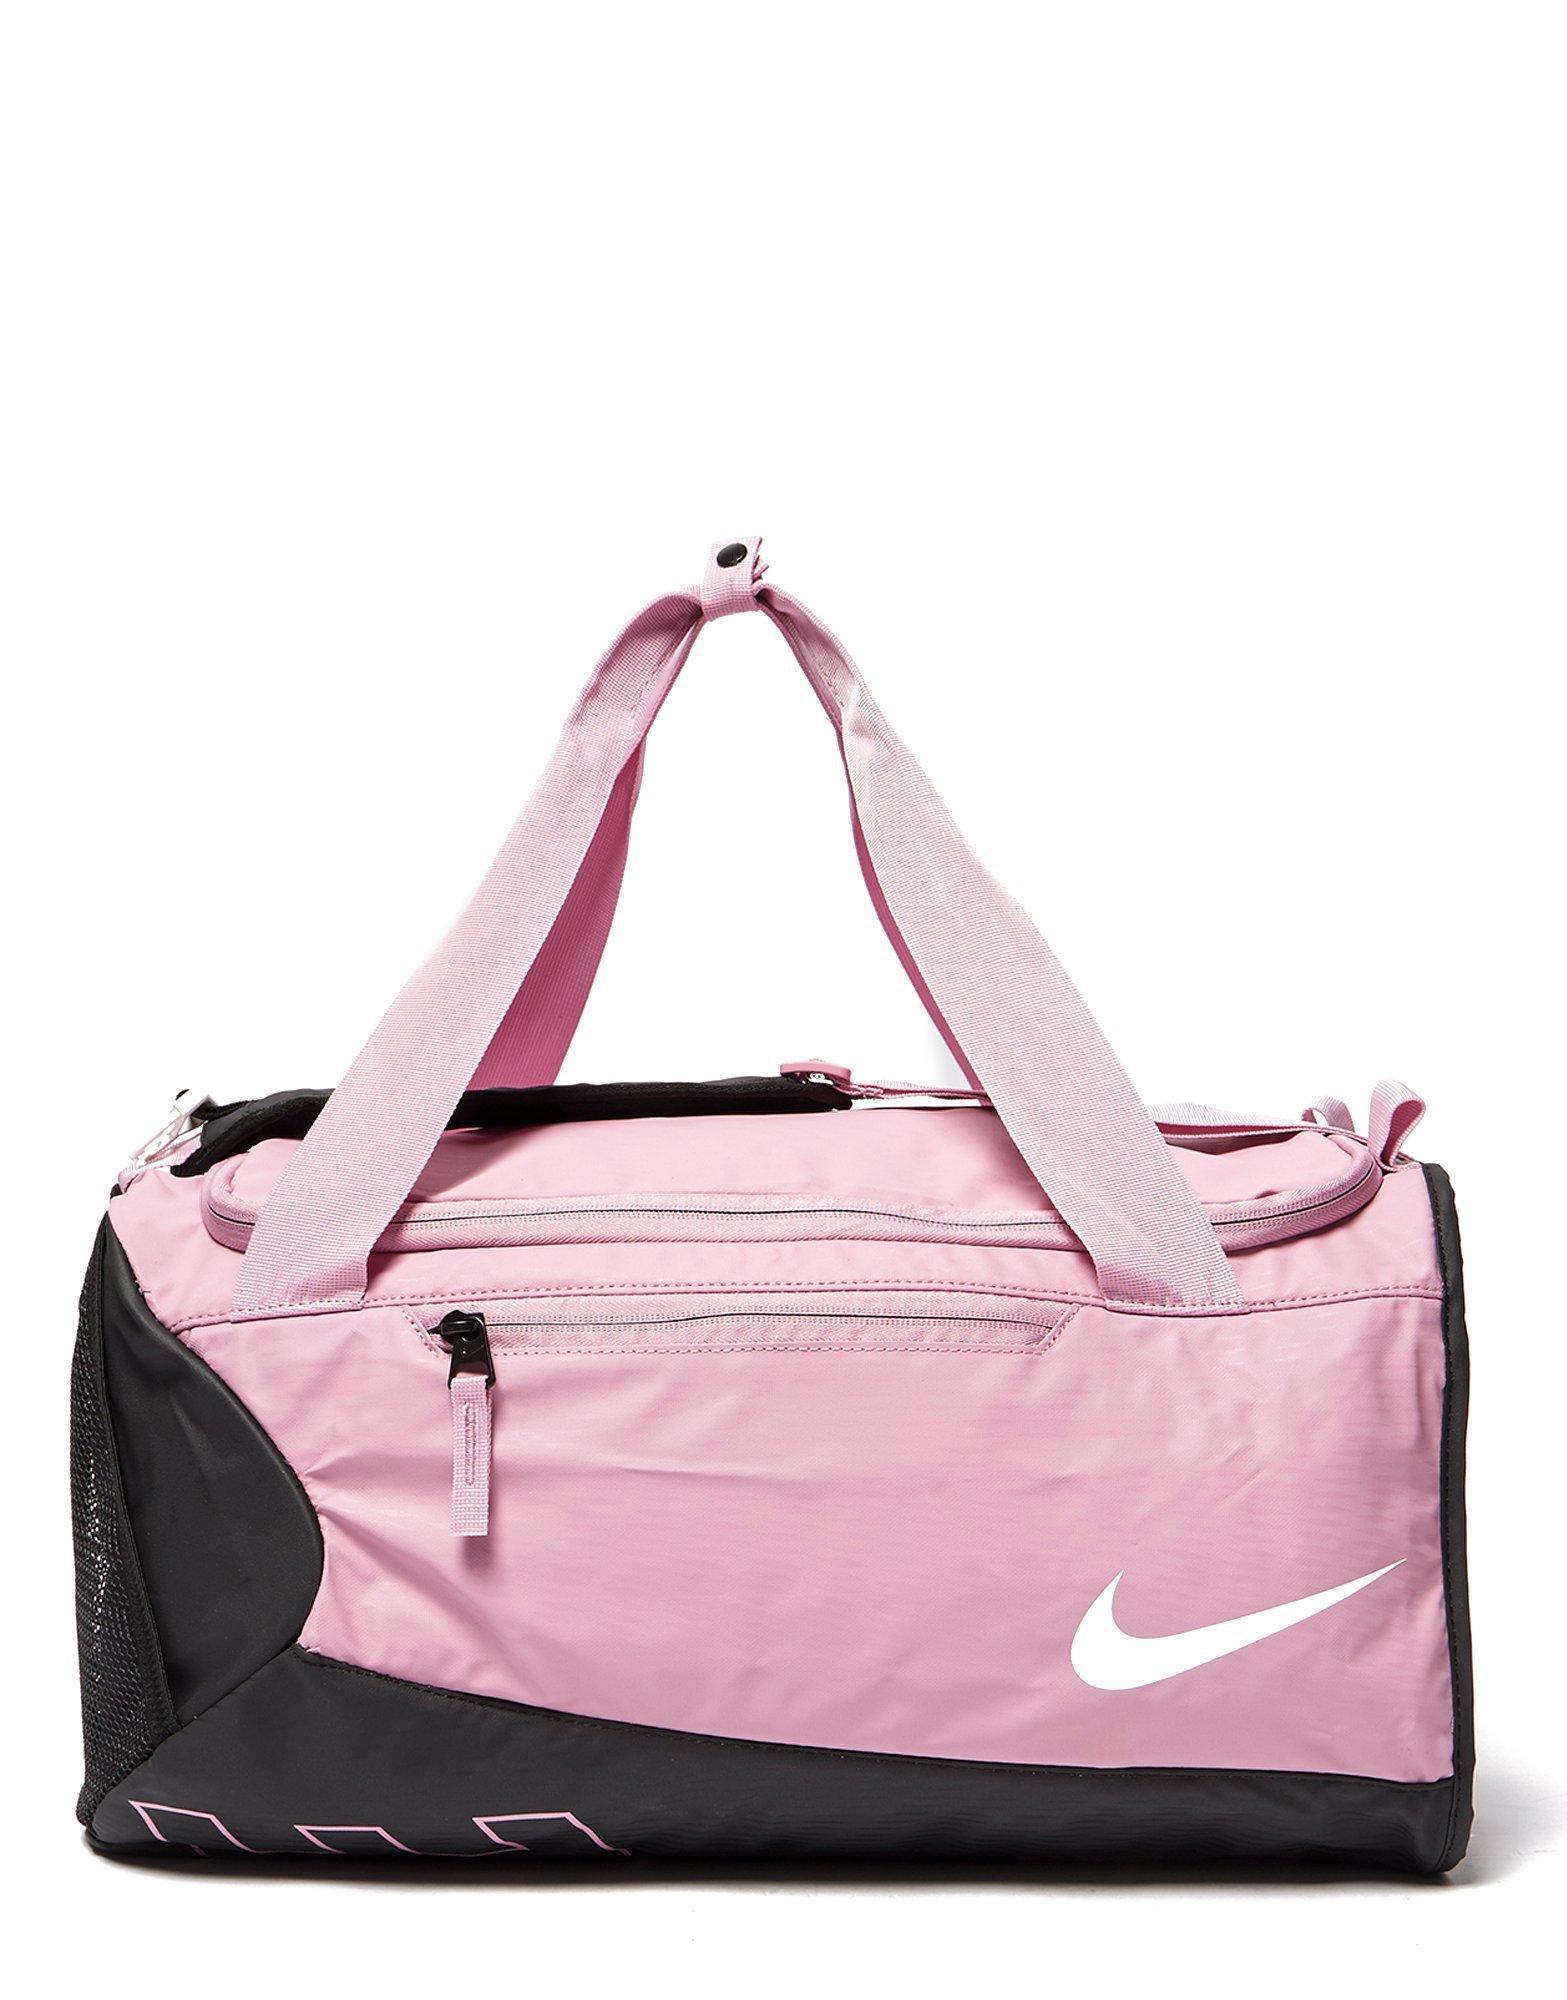 Alpha Duffle Bag